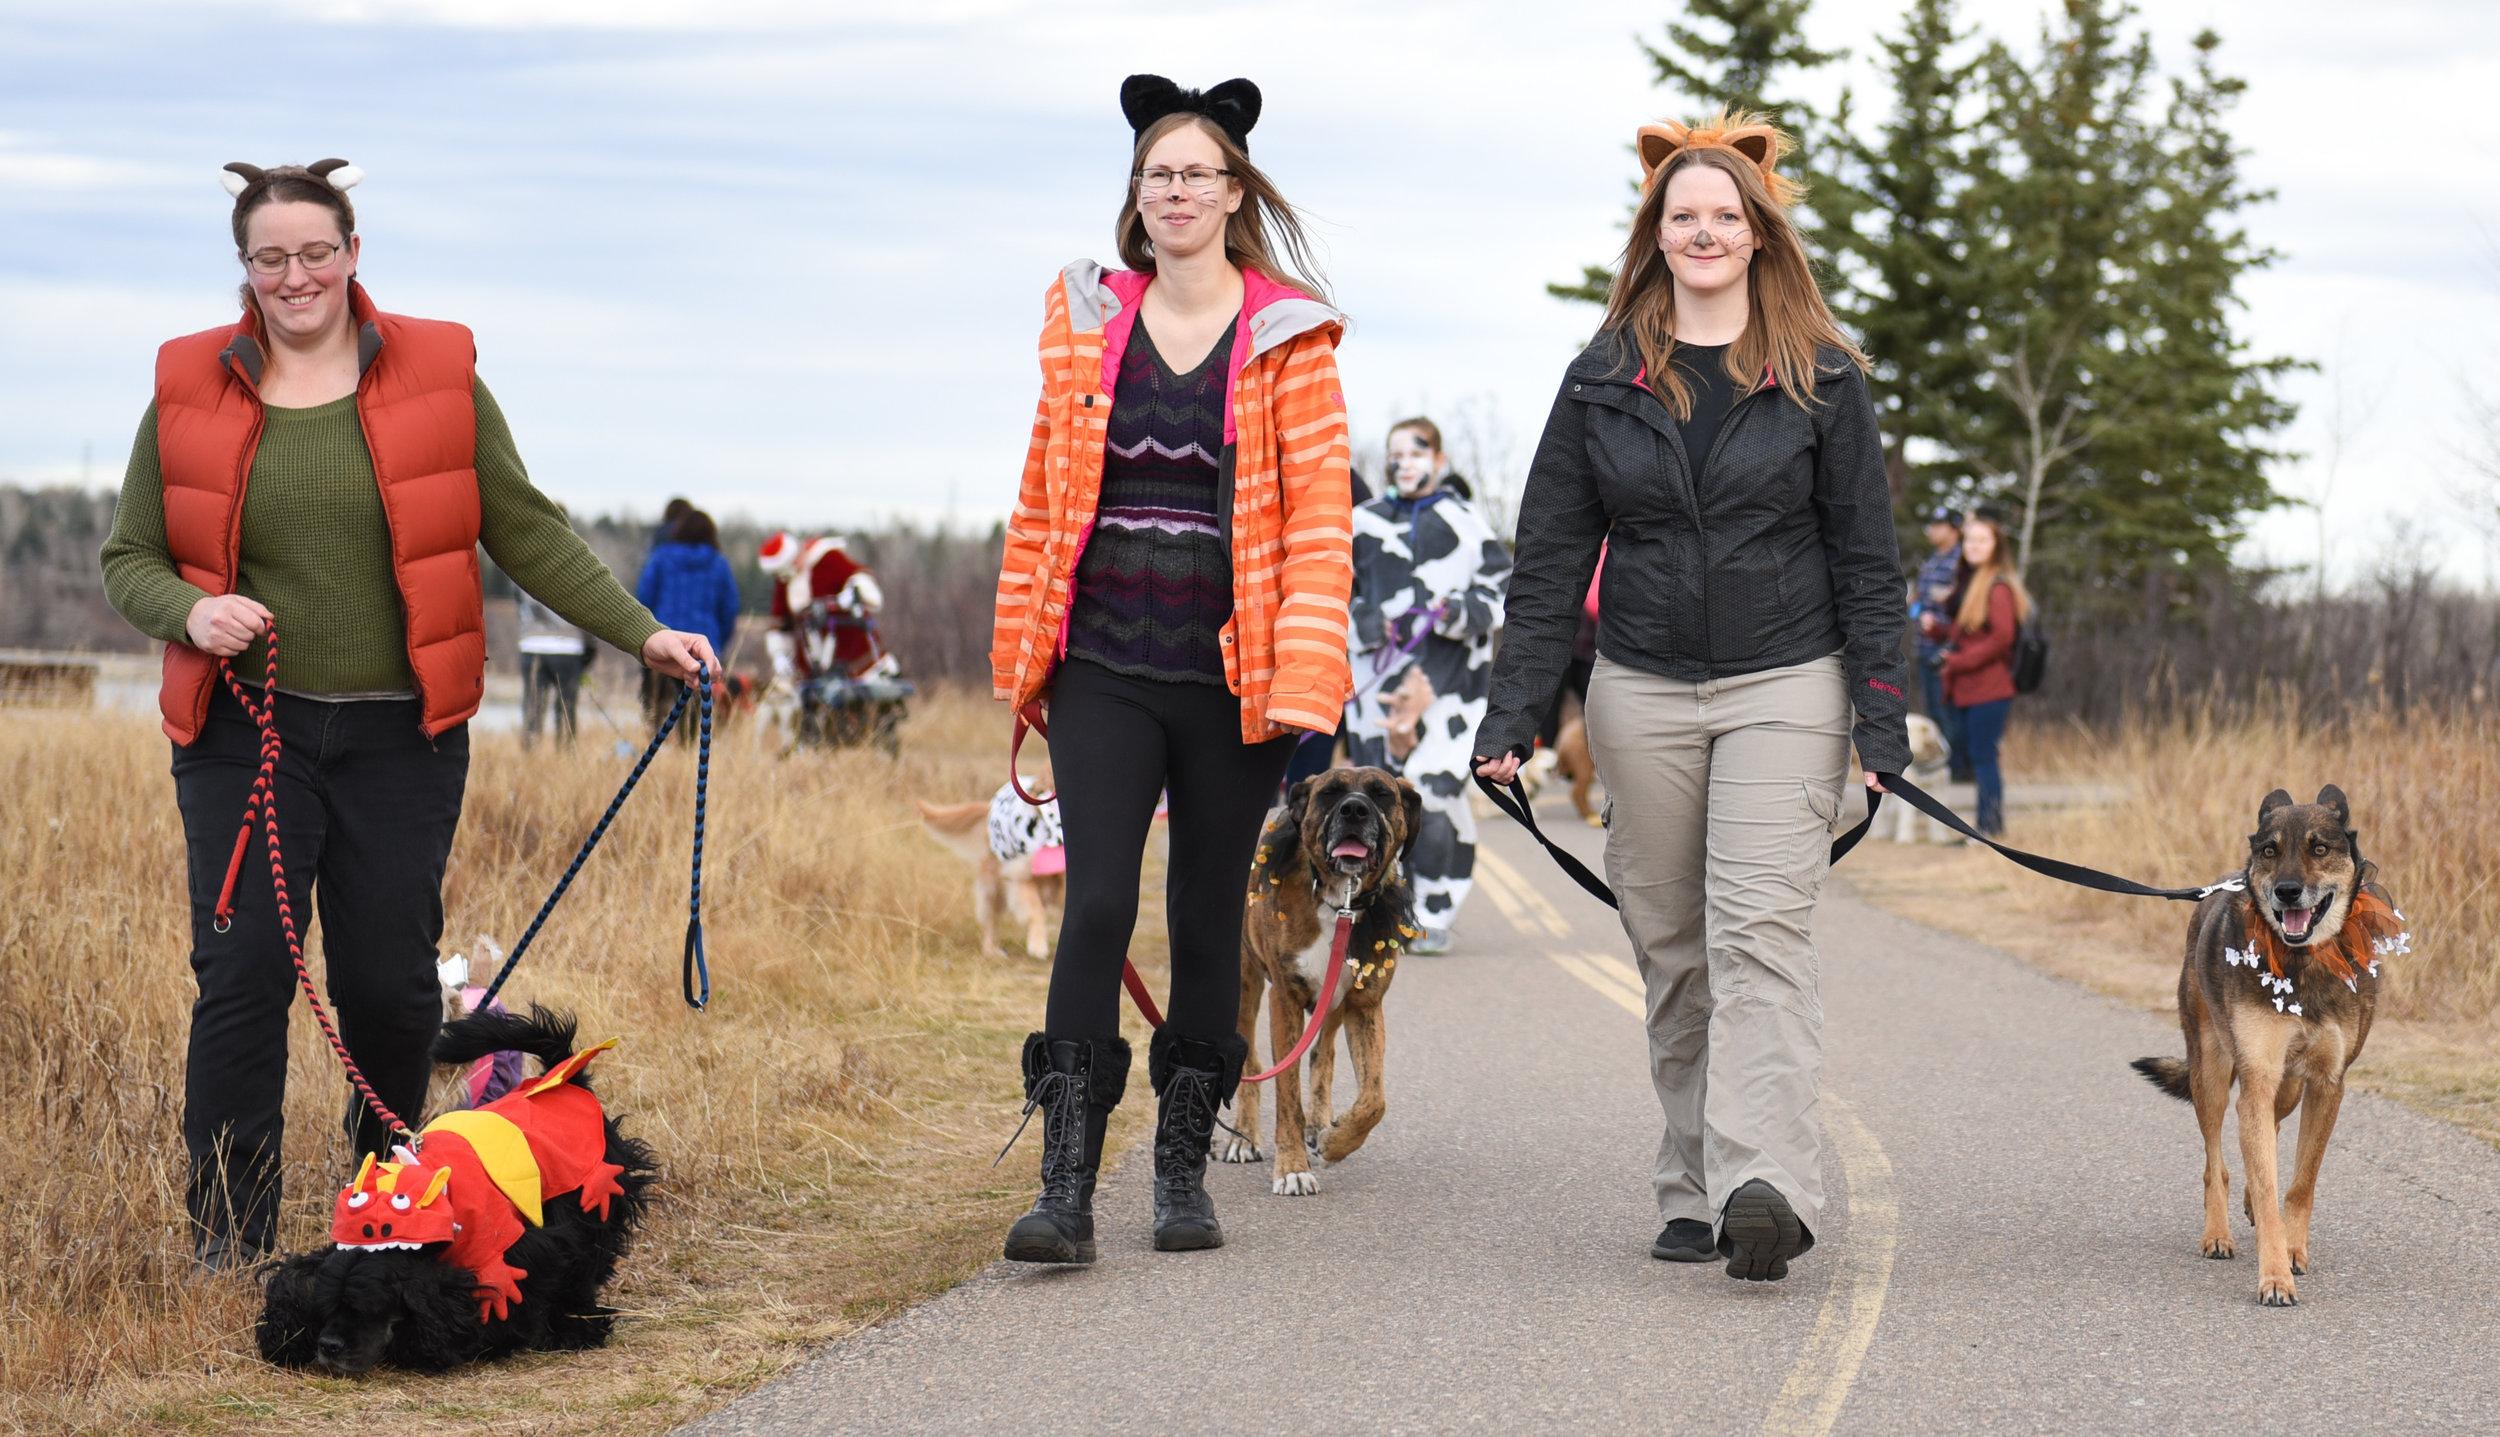 00-20171027 Tails of Help 2017 Howloween Dog Walk SOT 0214.jpg